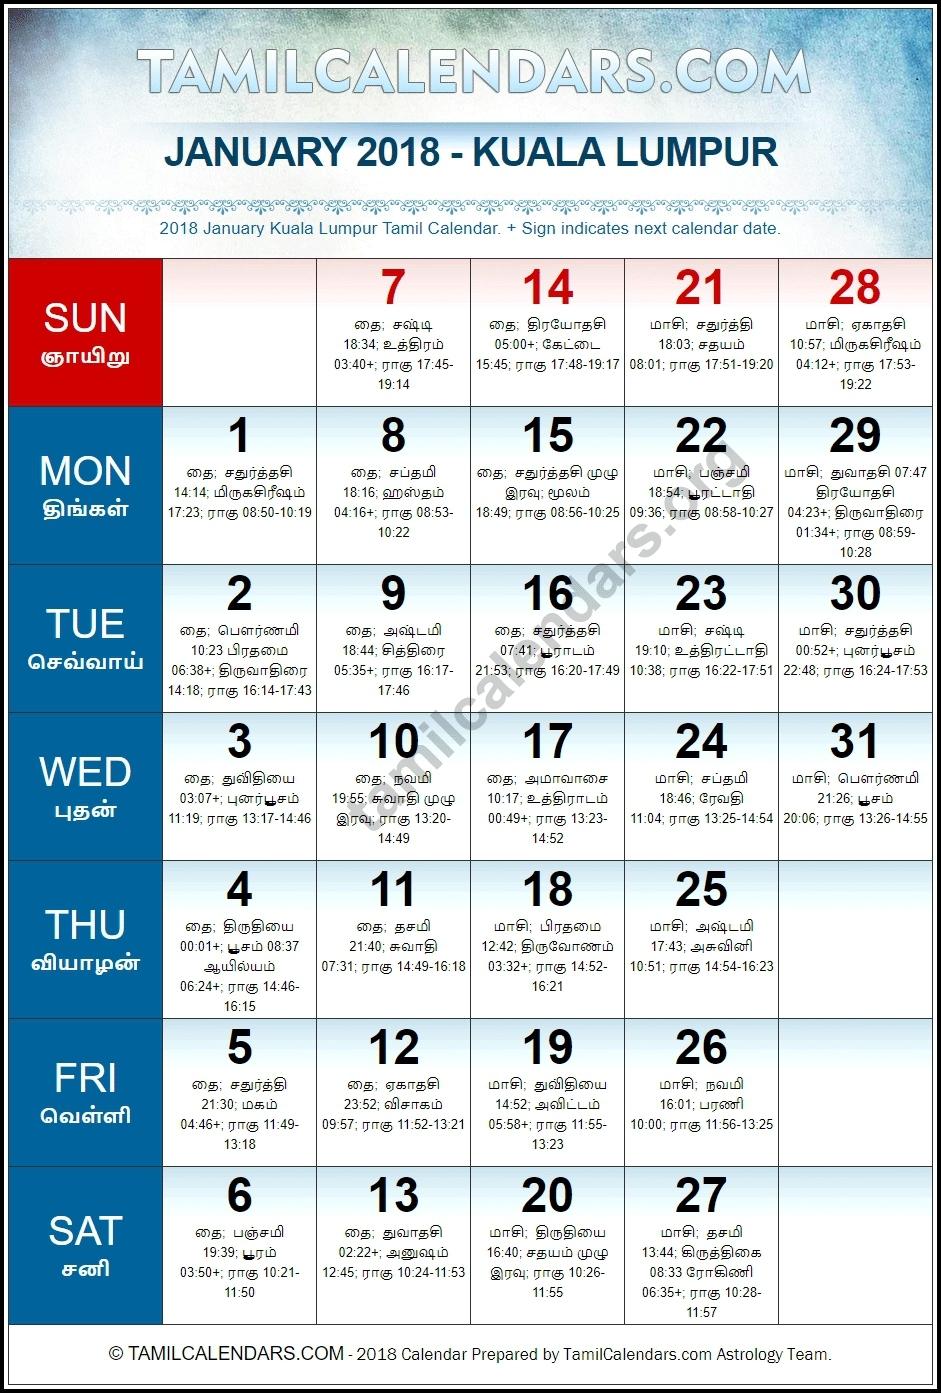 Southwest Airline Fare Calendar 2018 Calendar Printable Template